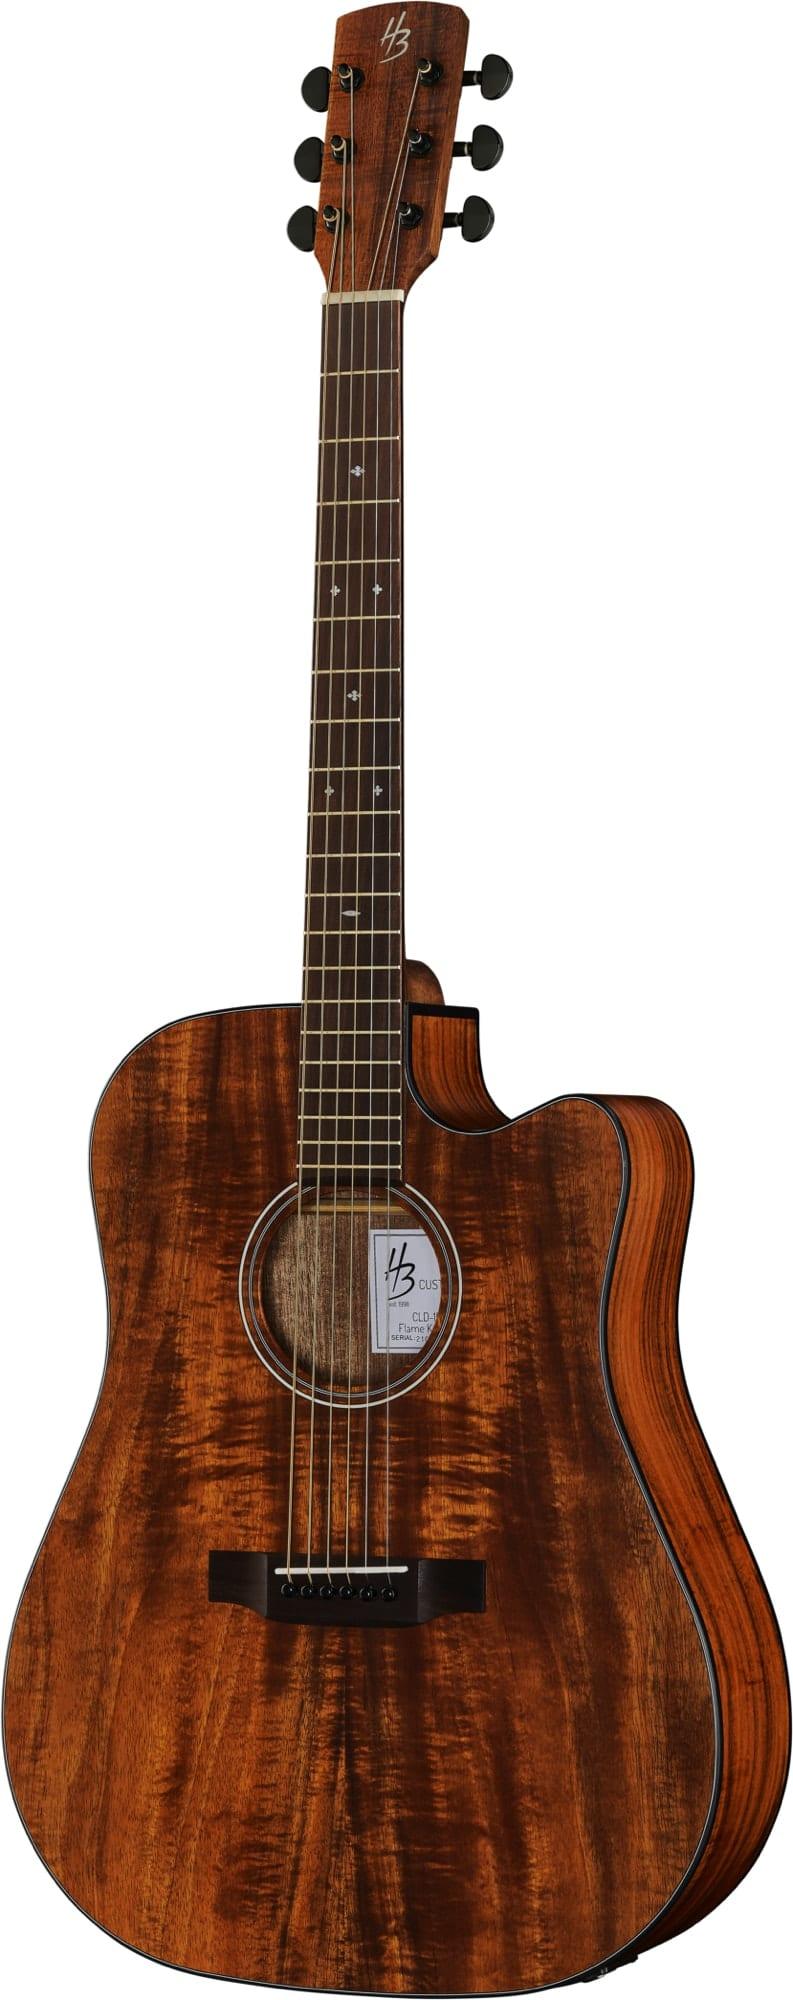 Harley Benton Exotic Wood Custom Line. Flamed Koa